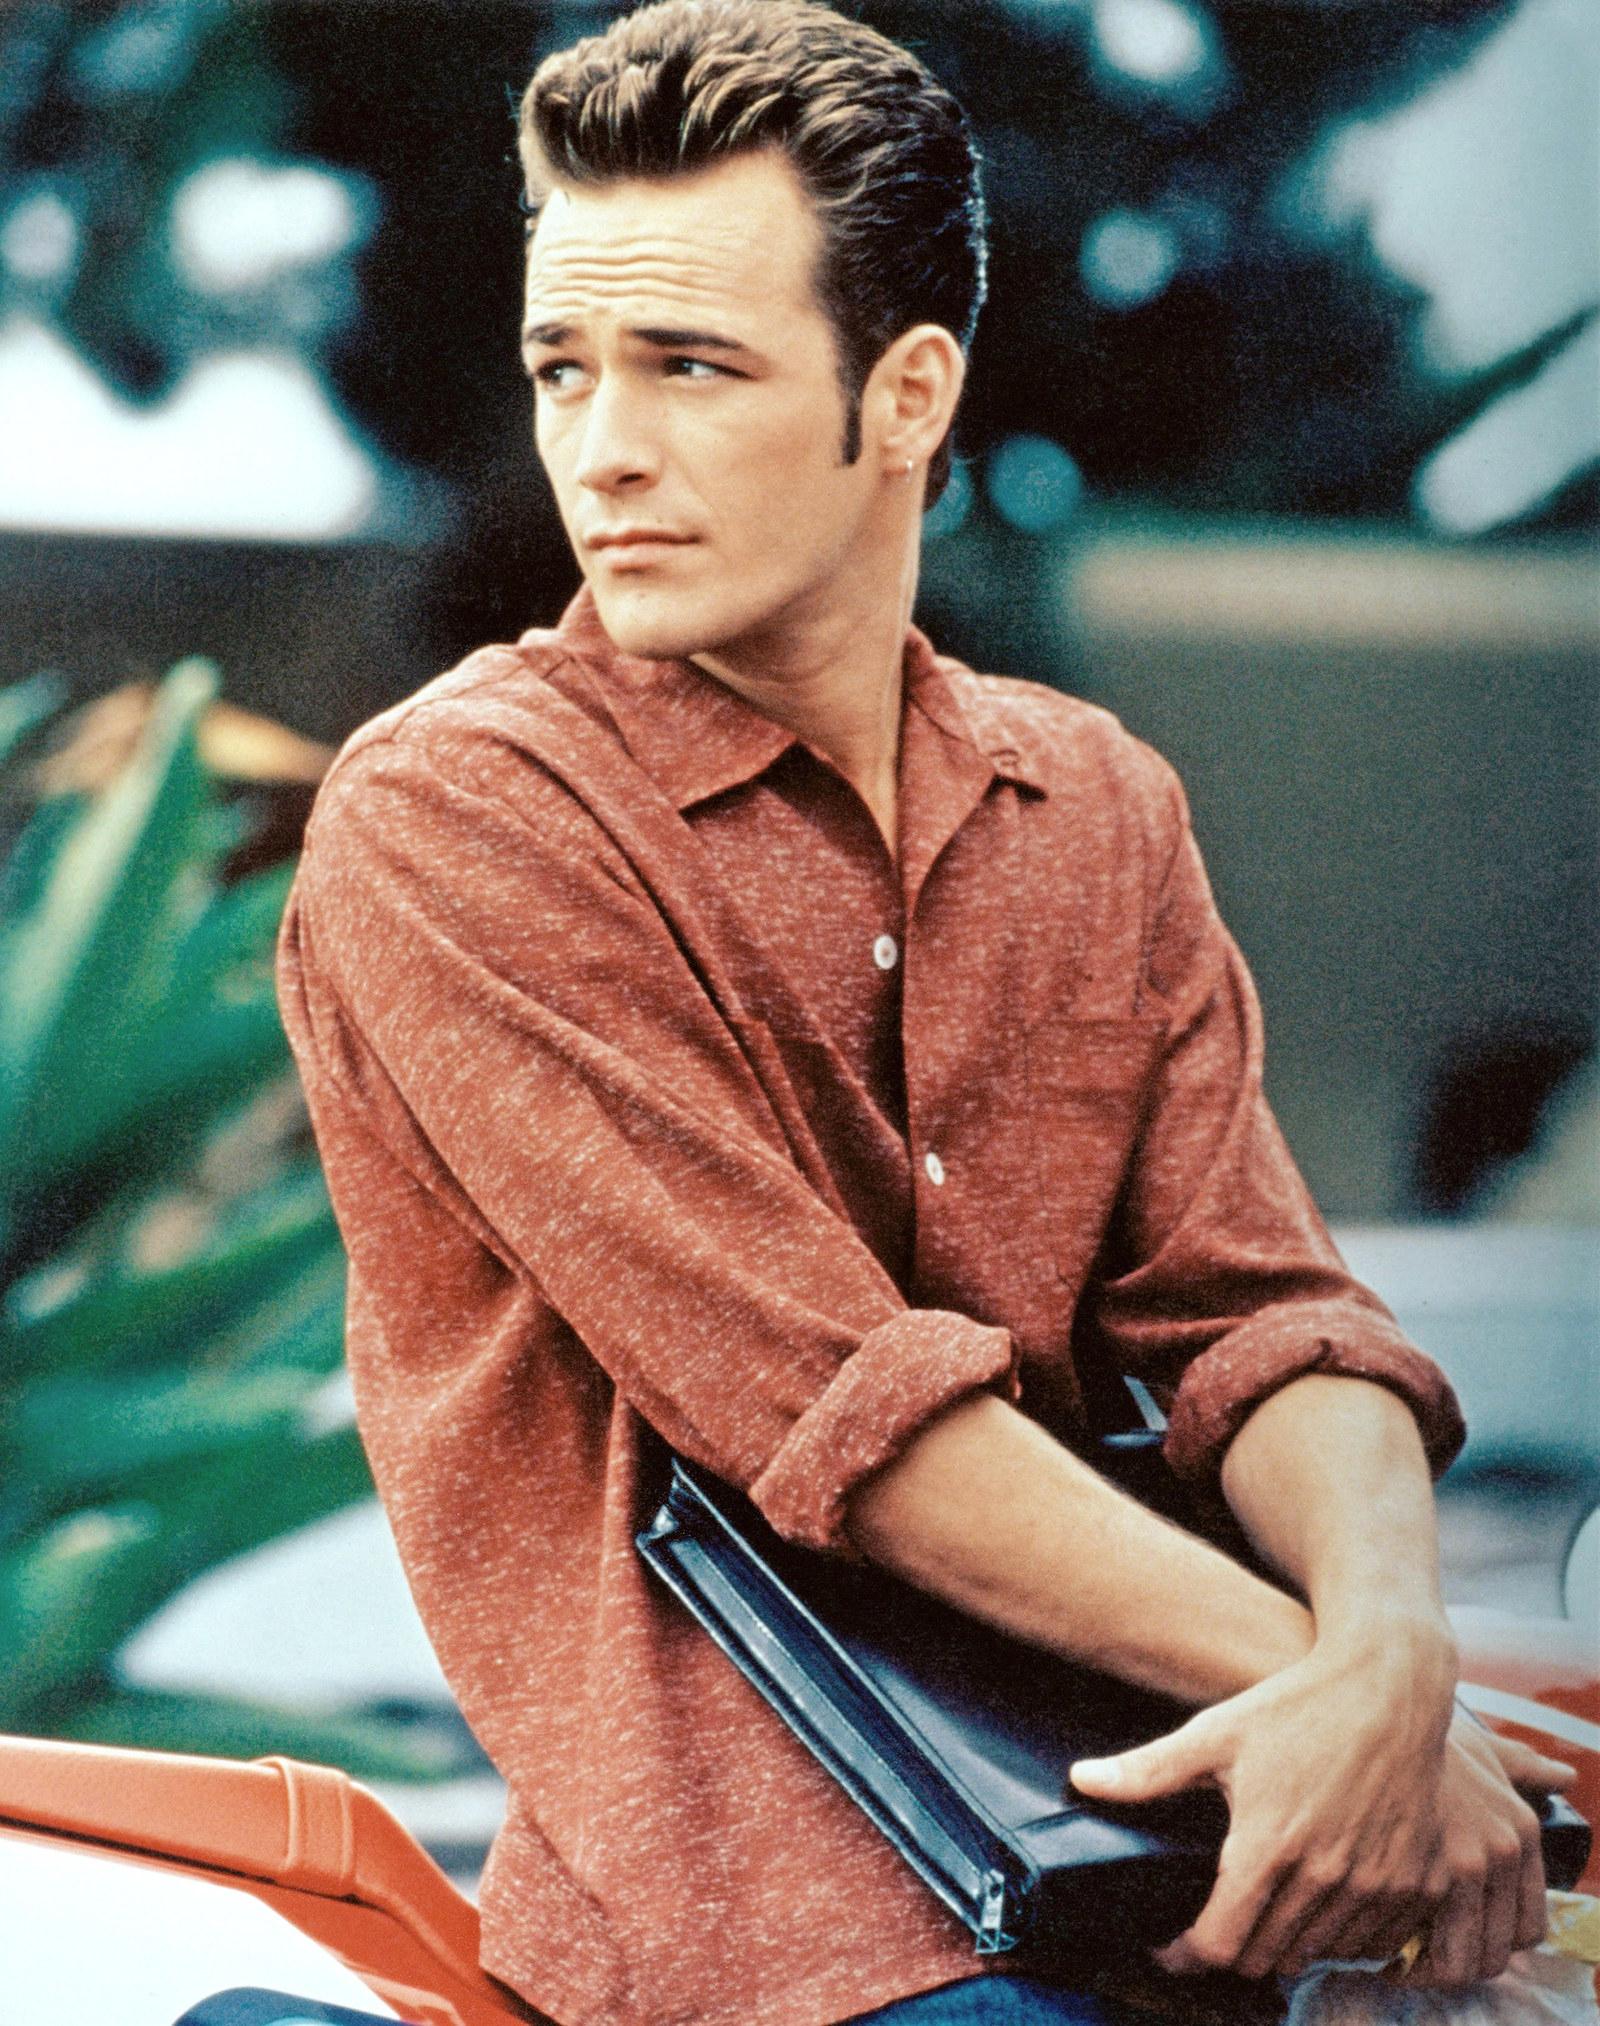 Luke Perry as Dylan McKay - Then:  Teen heartthrob.